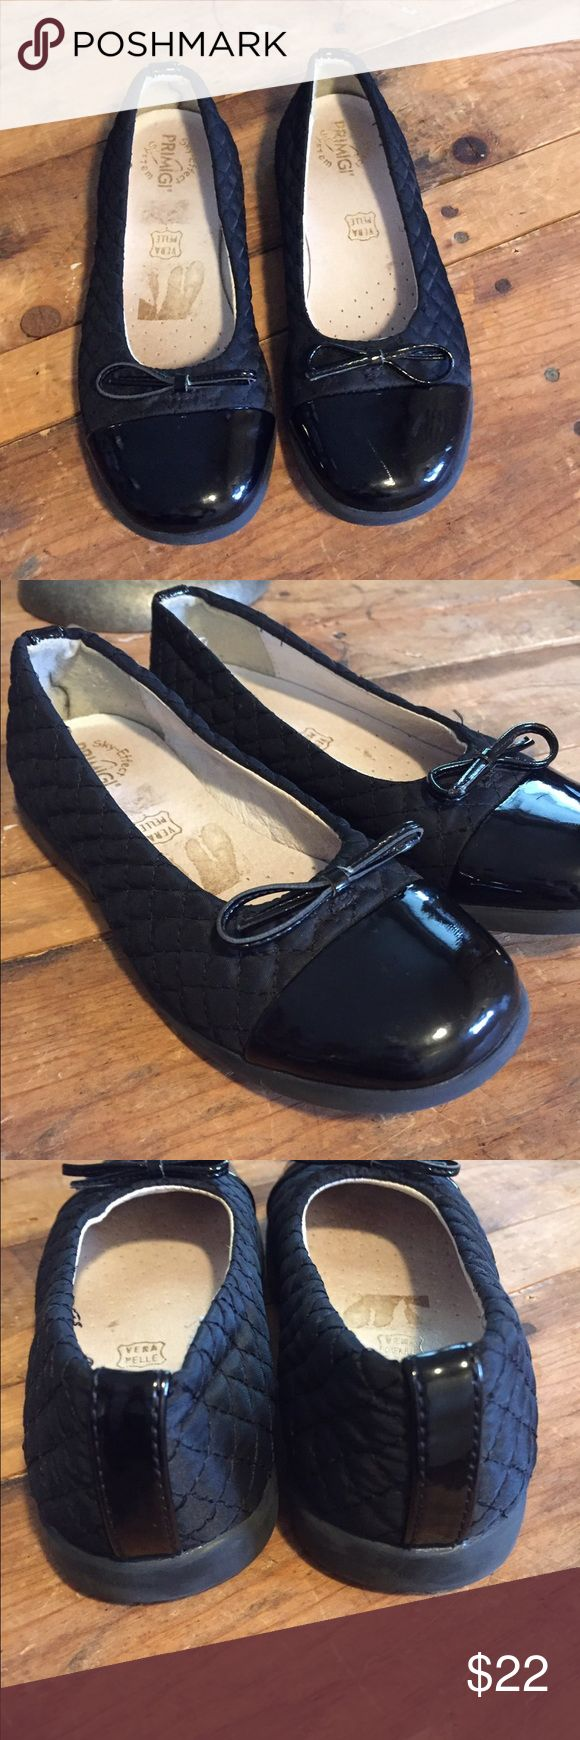 Selling this Primigi shoes on Poshmark! My username is: tarynbryn. #shopmycloset #poshmark #fashion #shopping #style #forsale #Primigi #Other